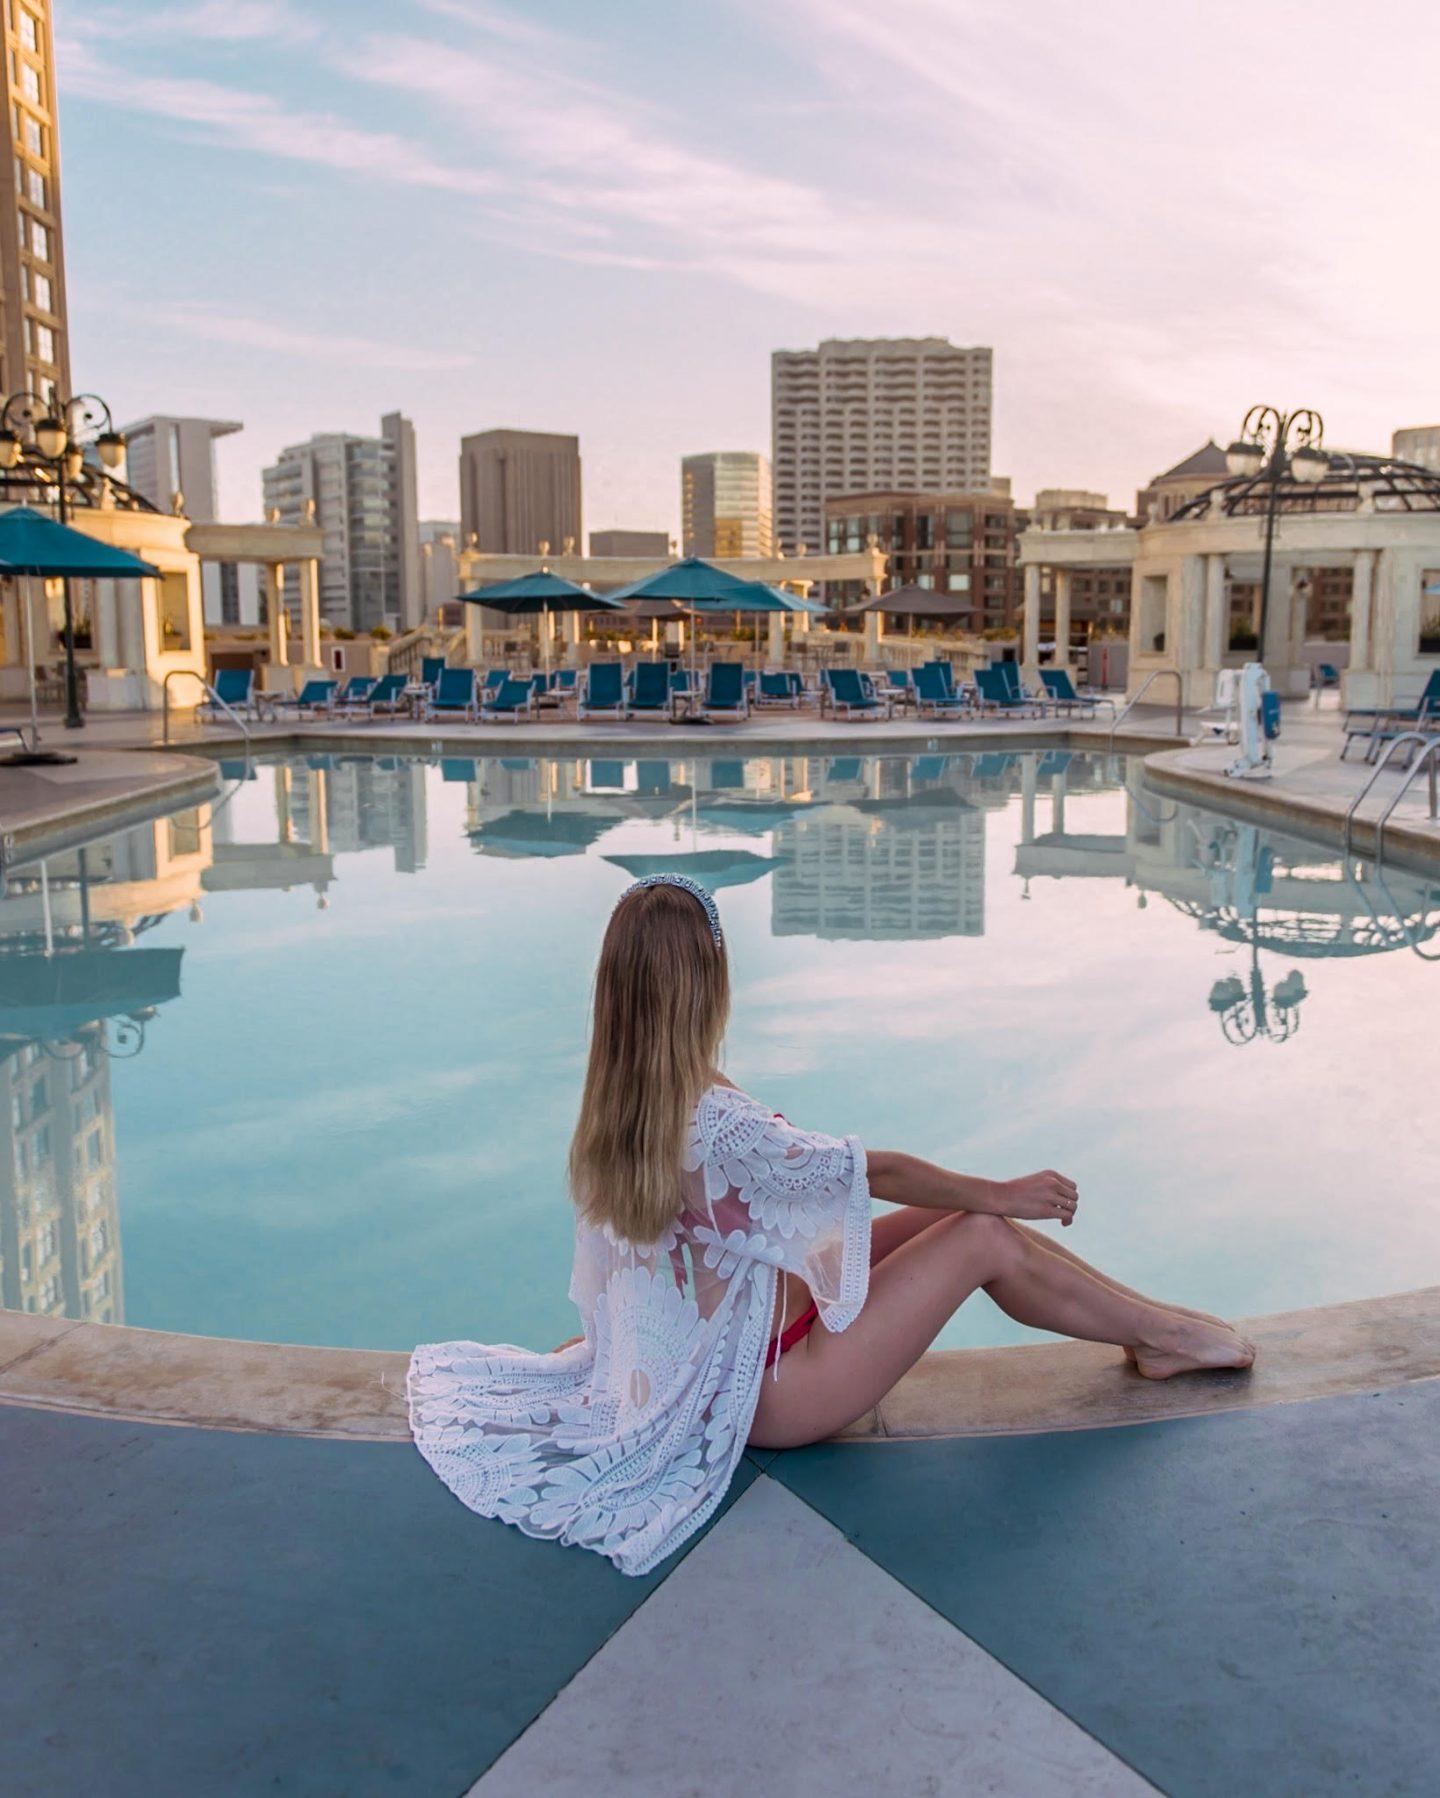 Sunrise at the pool in Grand Hyatt San Diego